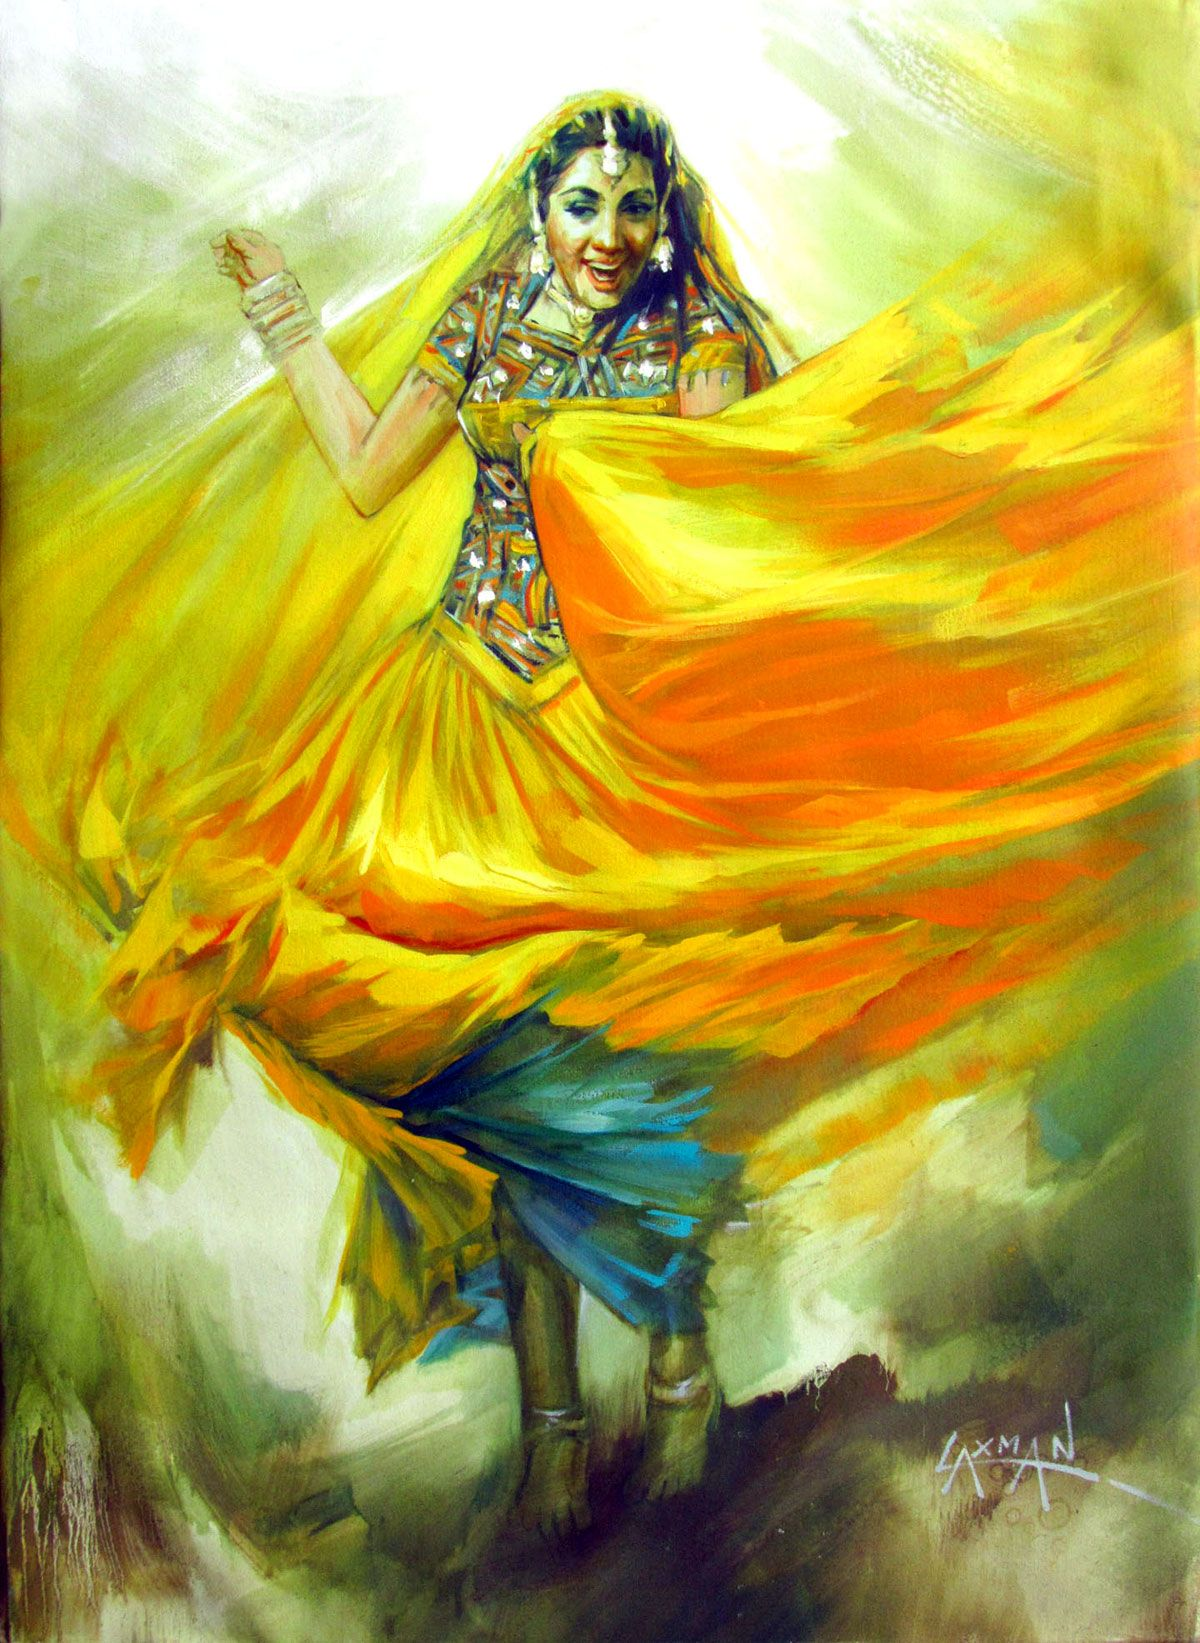 Laxman Kumar Google Search Indian art paintings, Dance